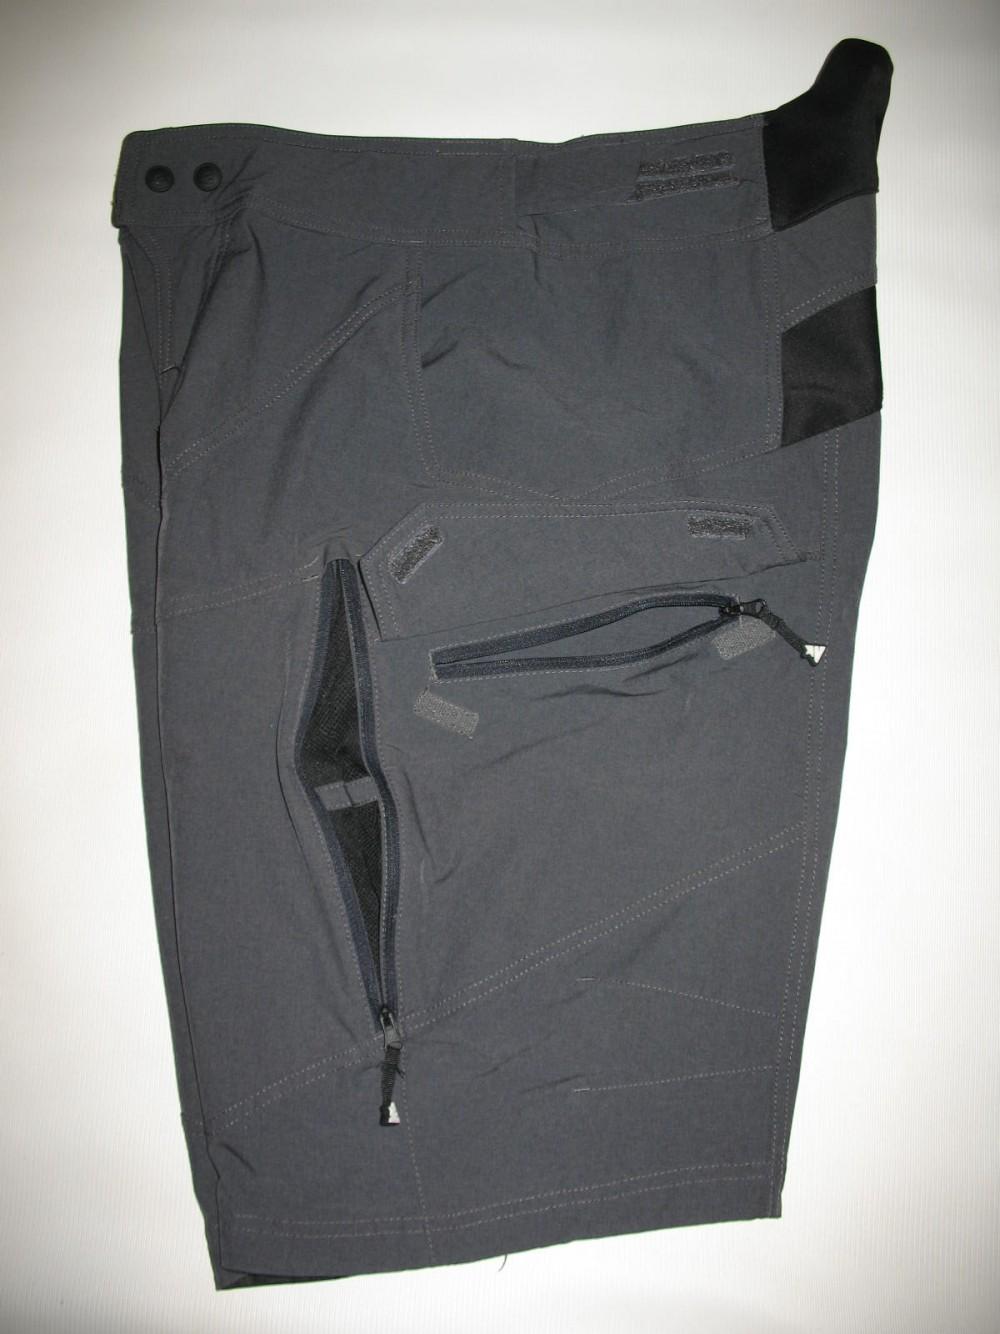 Велошорты ZIMTSTERN trailstar bike shorts (размер L) - 11